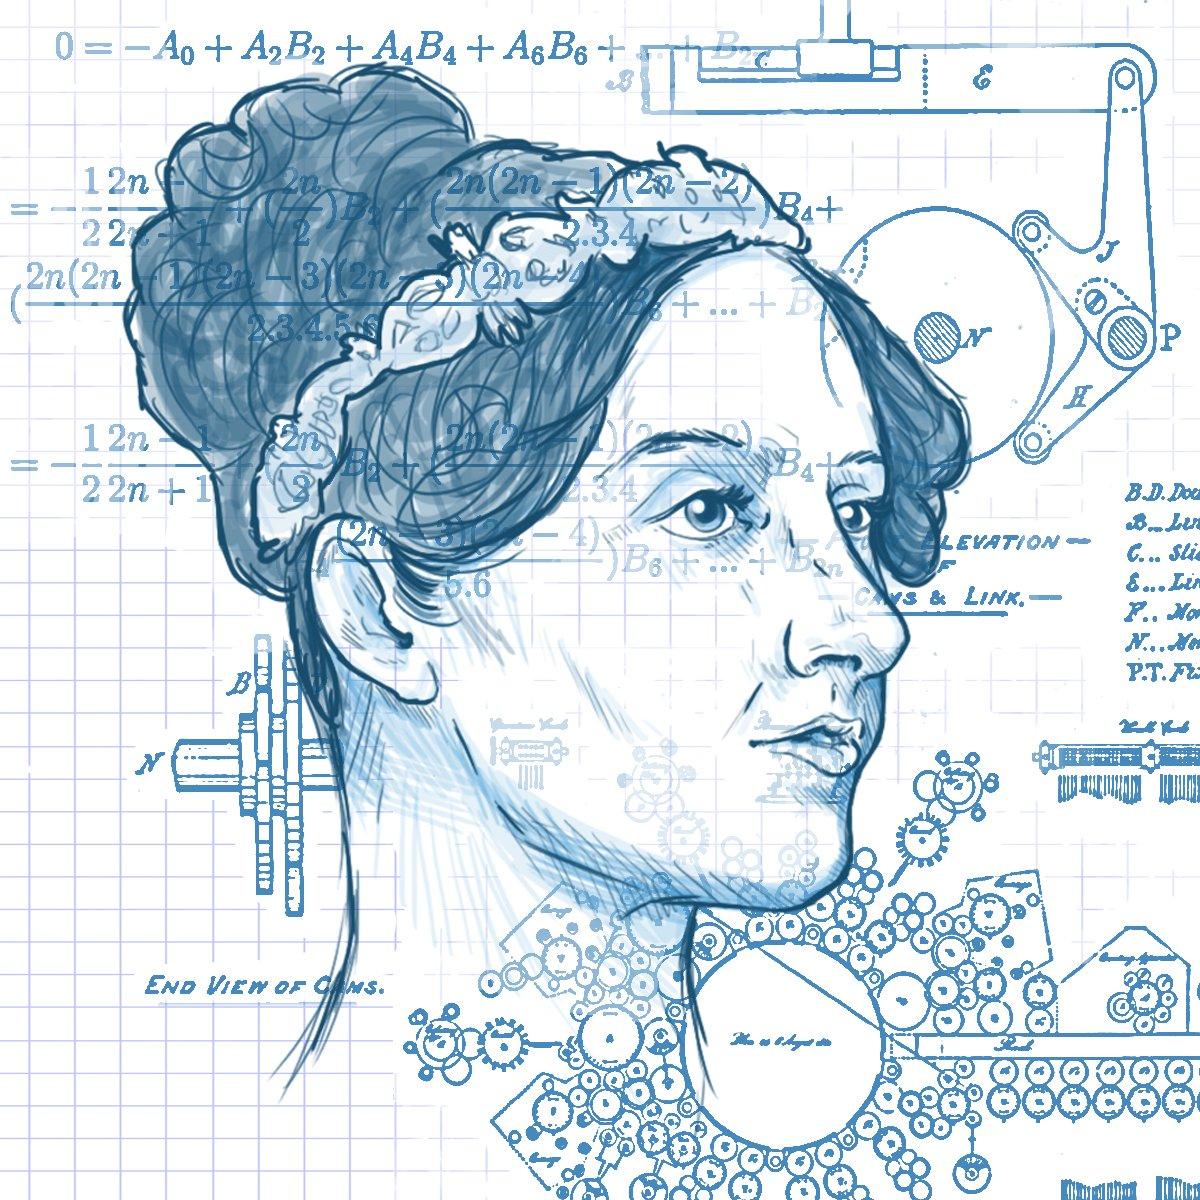 Tal día como hoy en 1815 nacía Ada Lovelace, la primera programadora de la historia https://t.co/rlZHF7ioMG